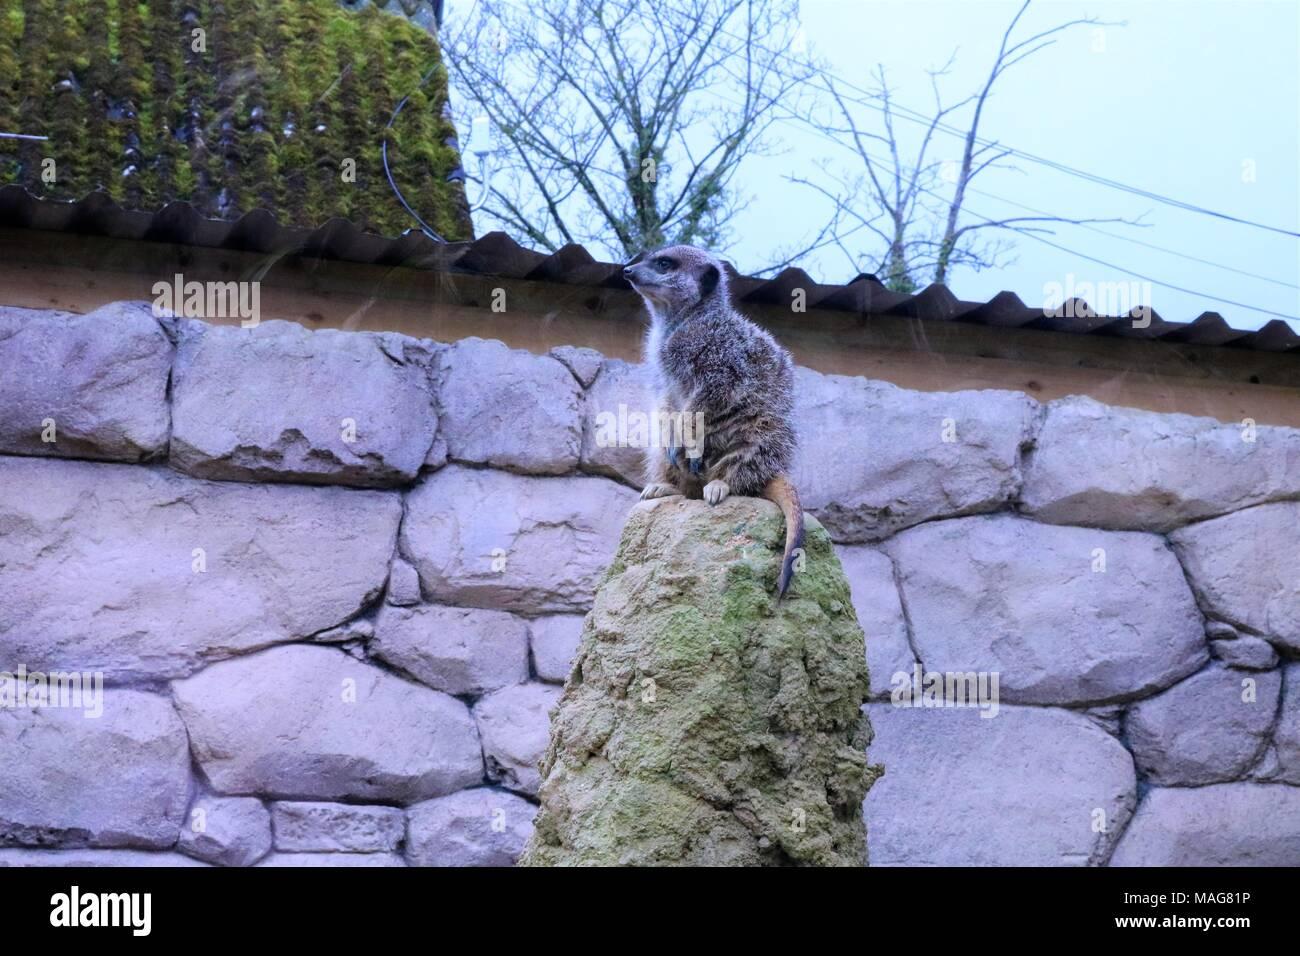 Meerkat a una attrazione turistica Immagini Stock